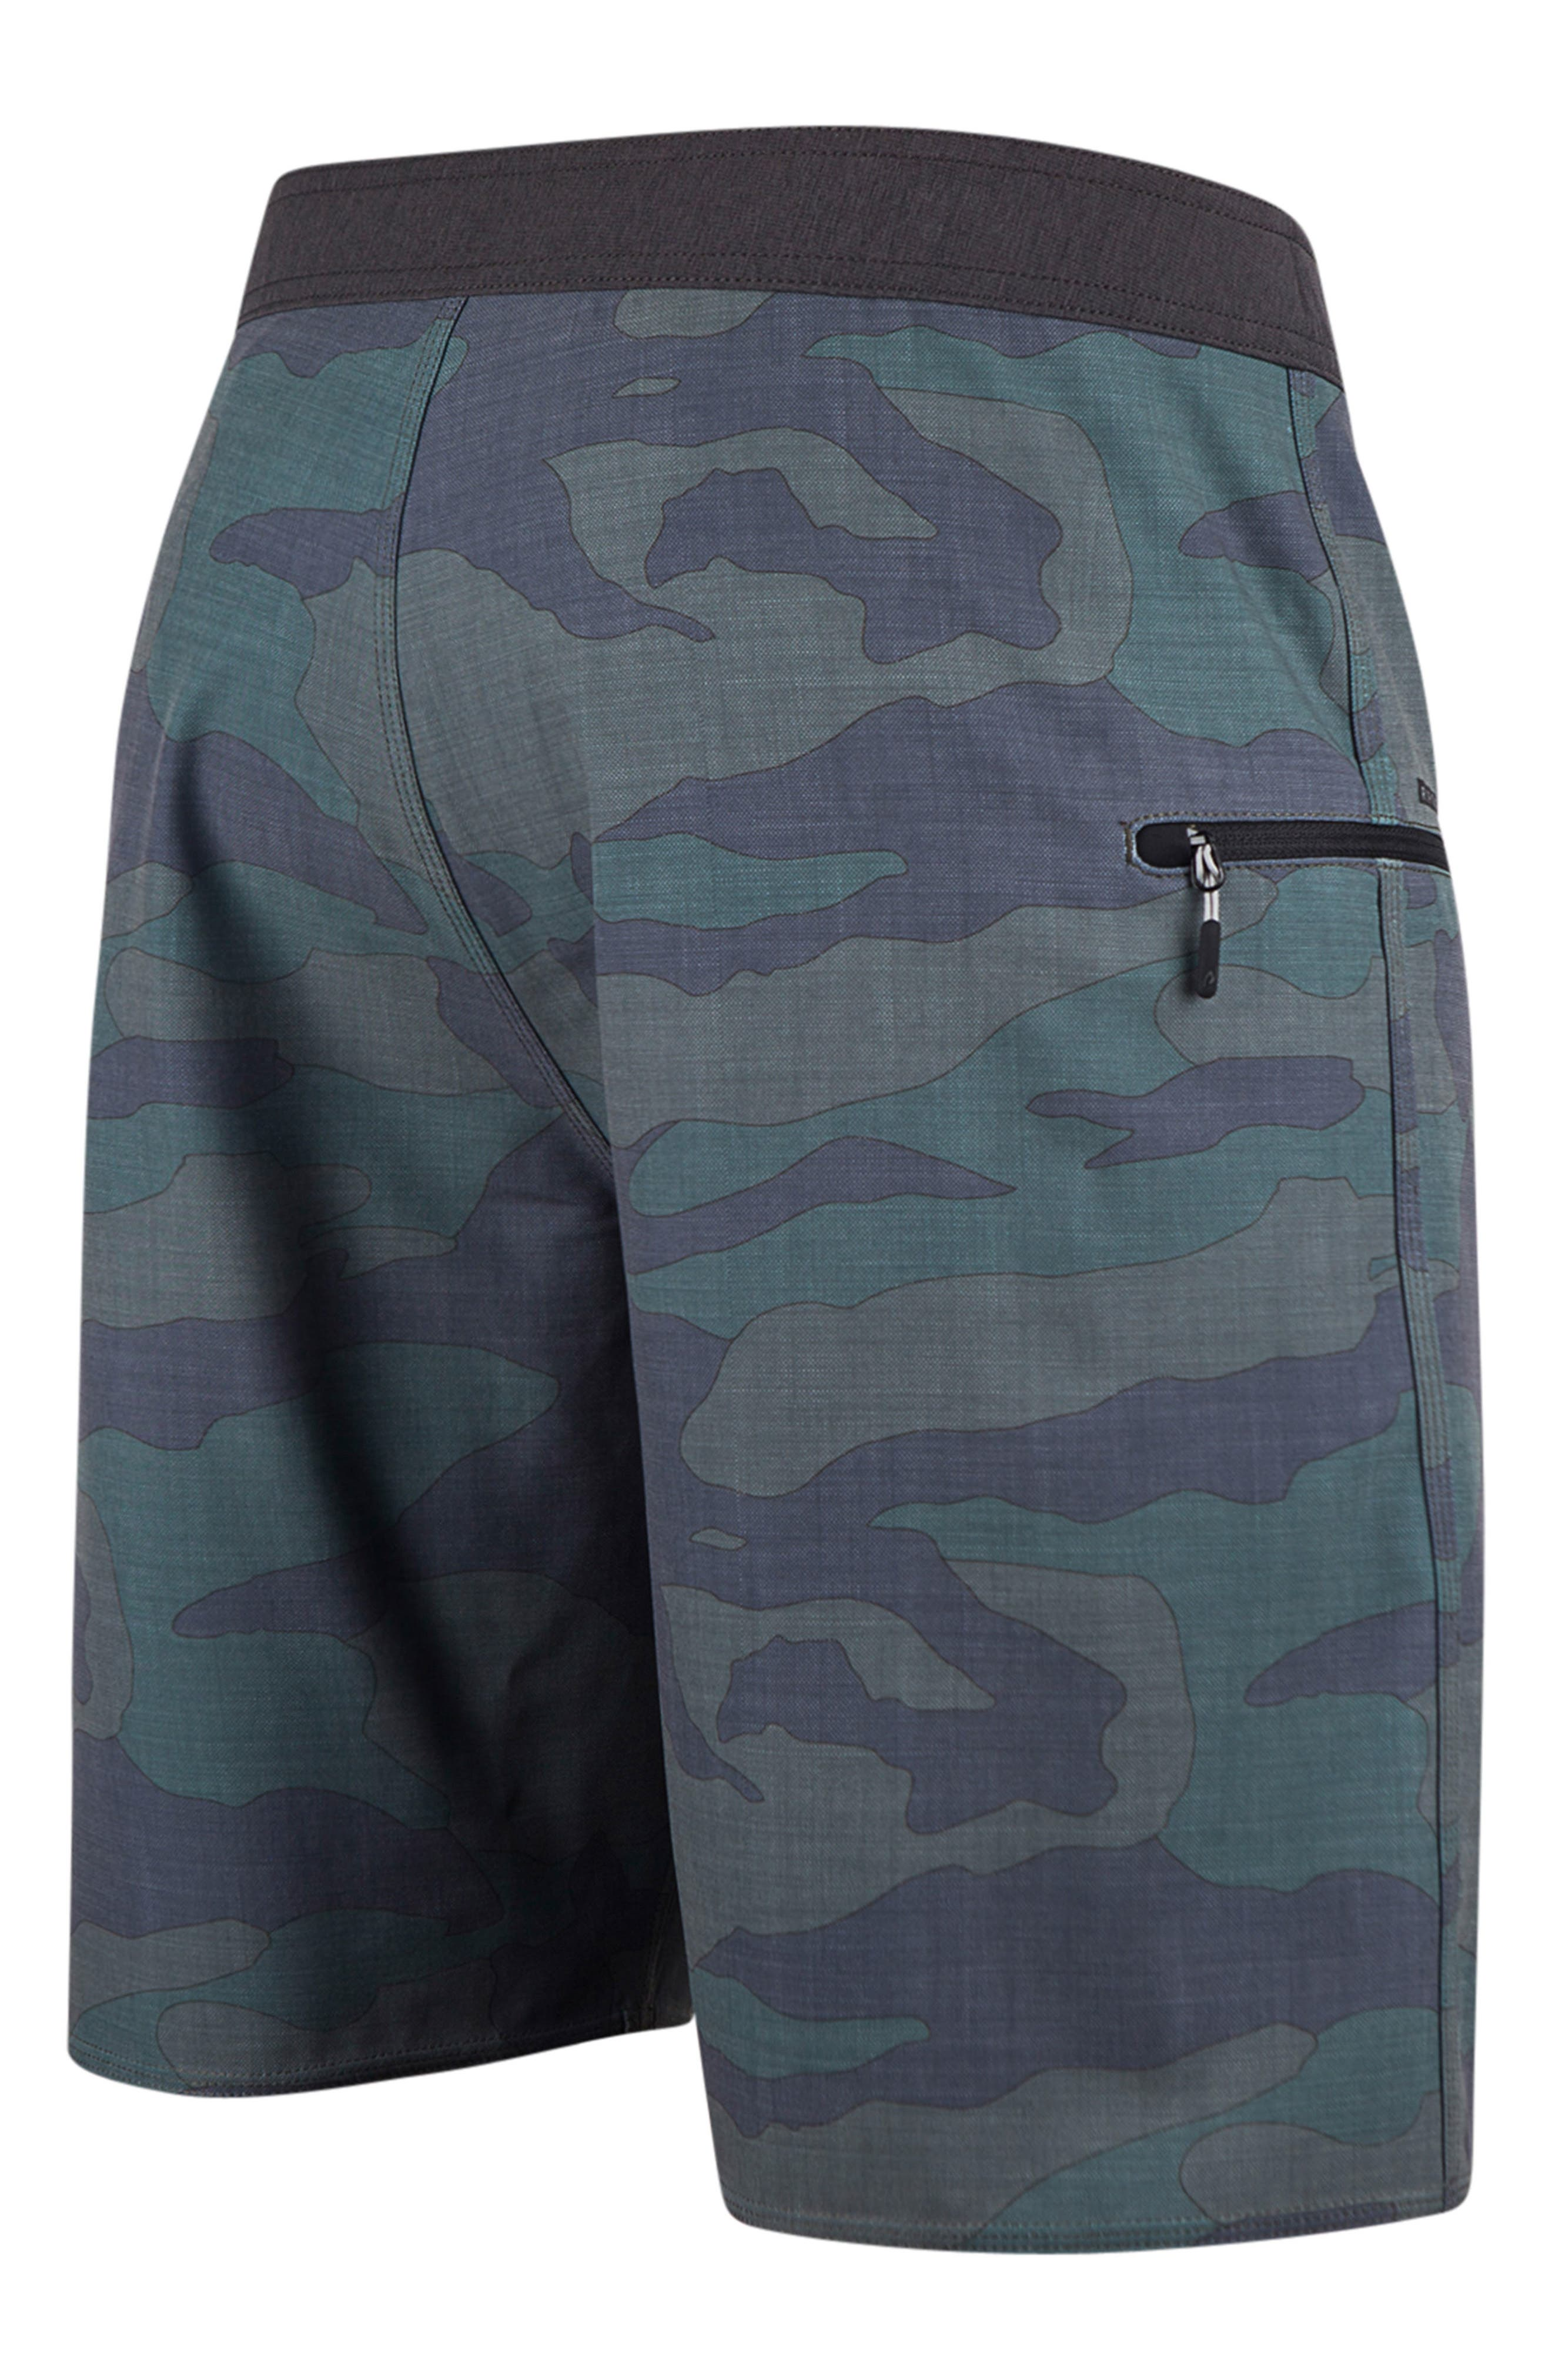 Mirage Backyard Board Shorts,                             Alternate thumbnail 2, color,                             344